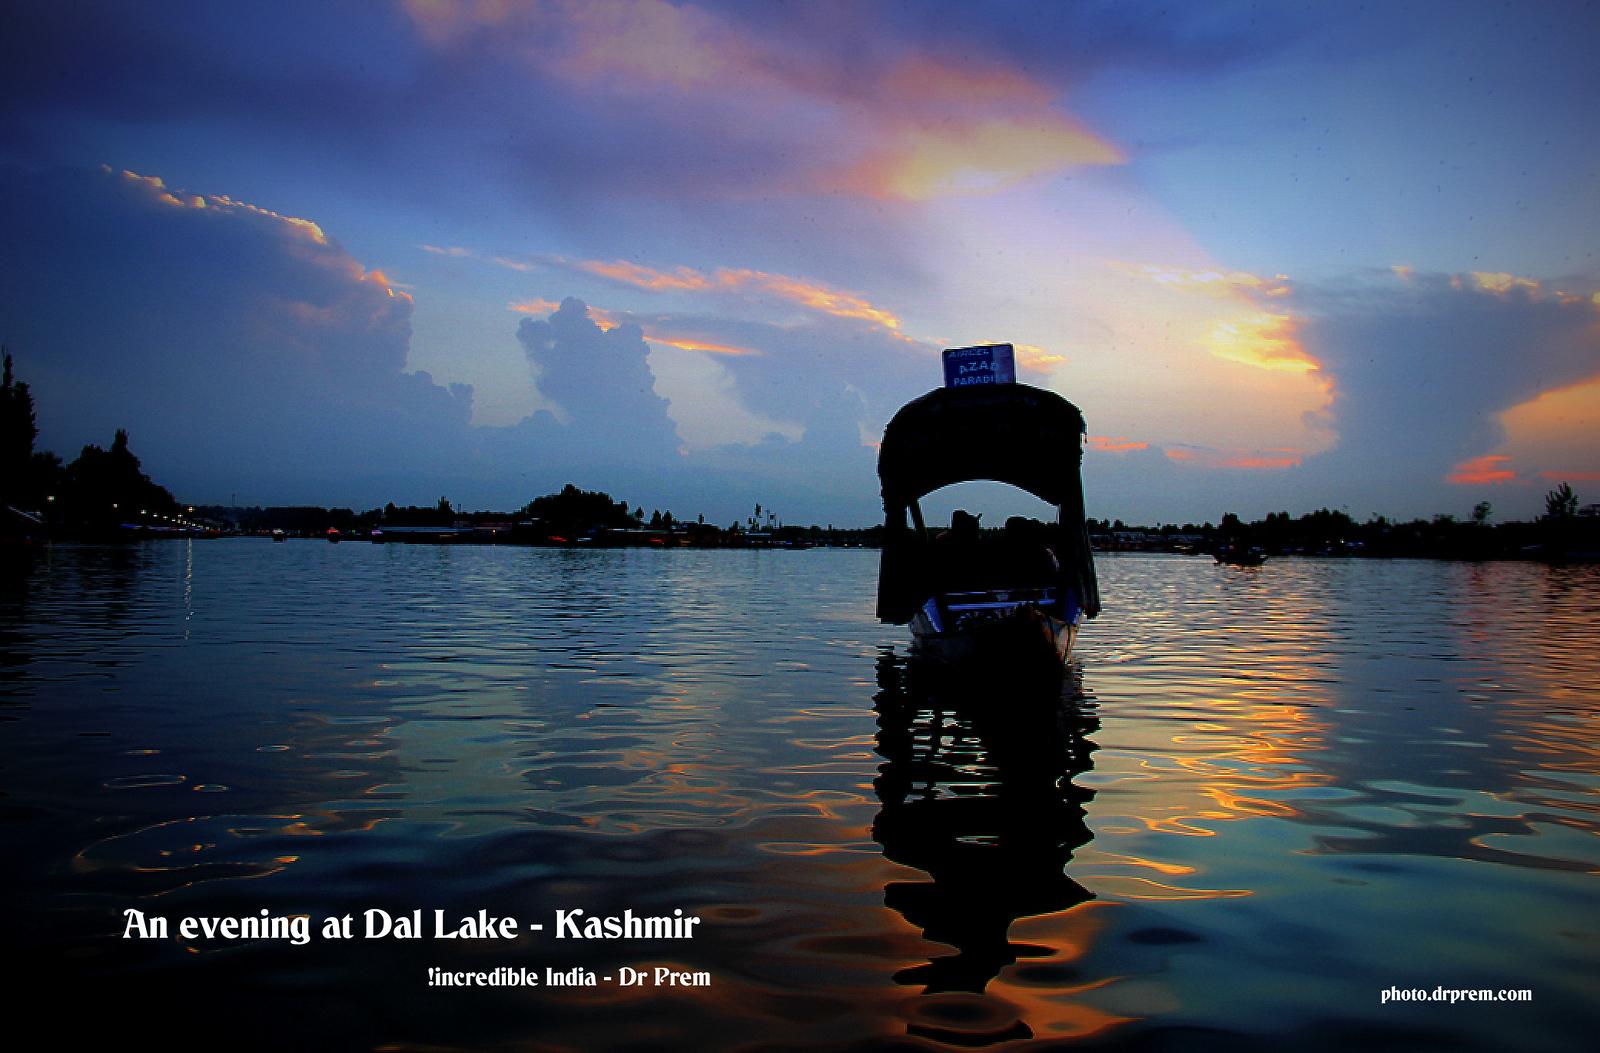 An evening at Dal Lake Kashmir